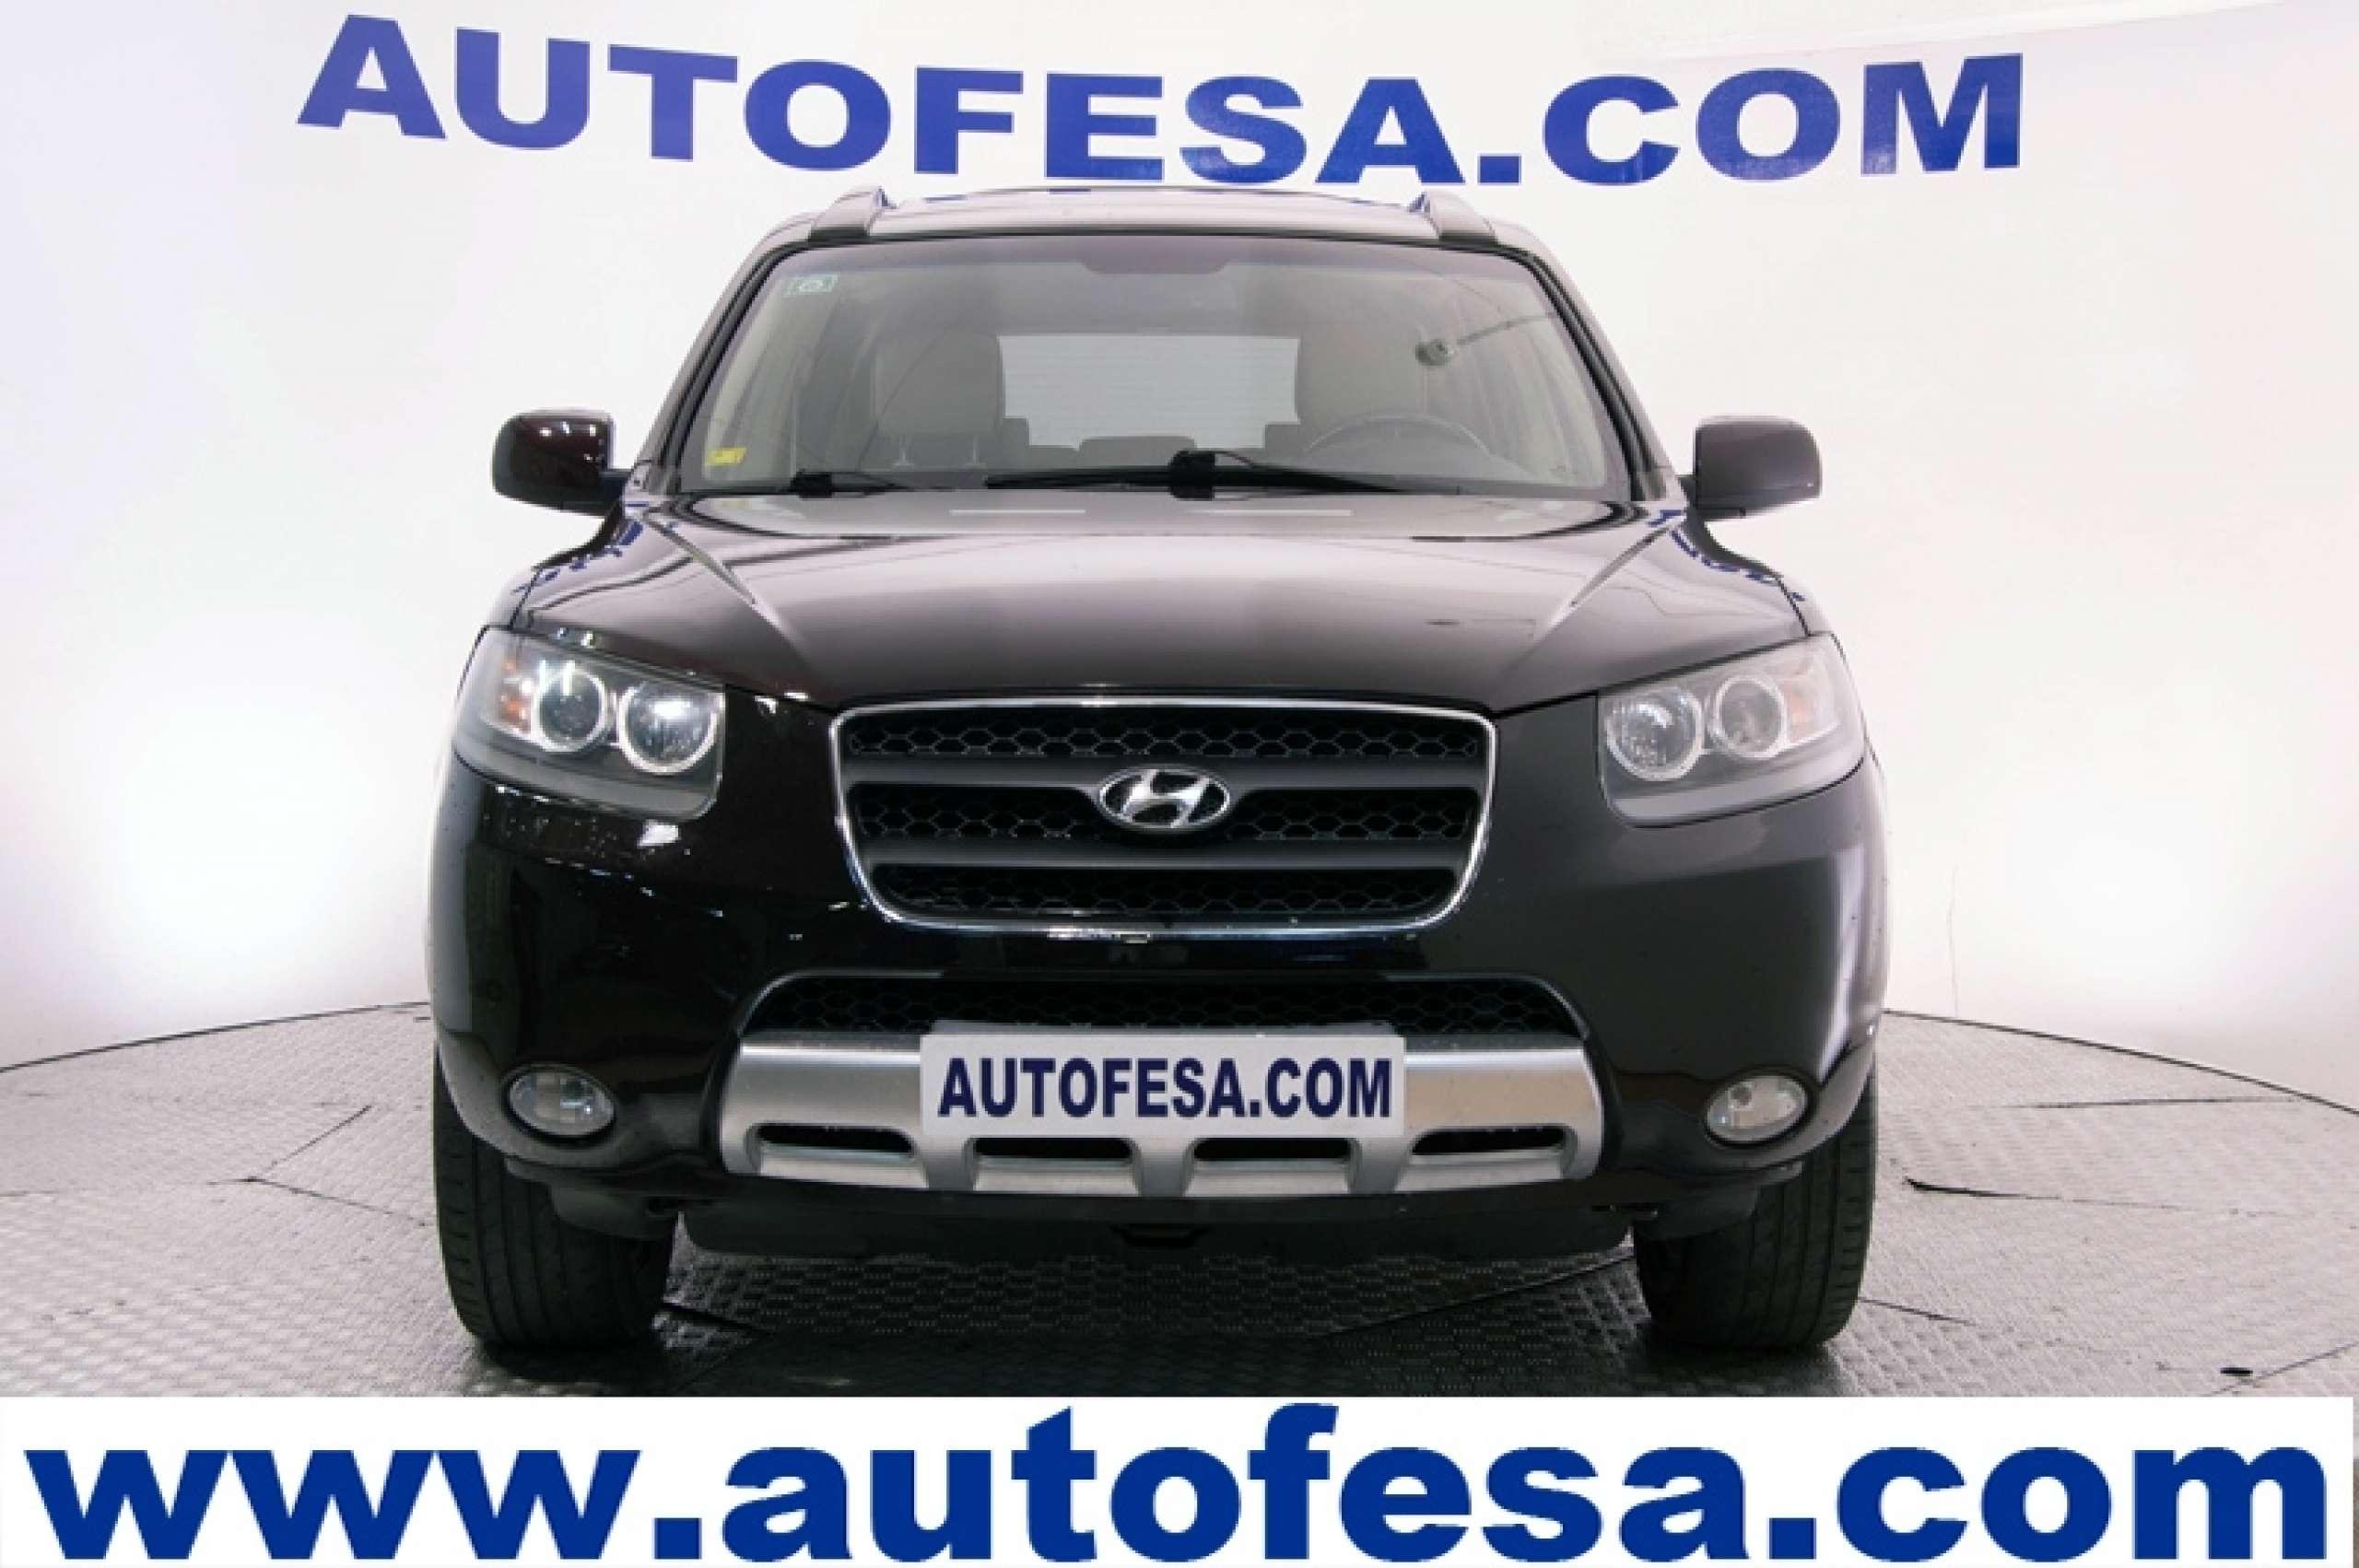 Hyundai Santa Fe 2.2 CRDI 155cv Style Auto 5p - Foto 2